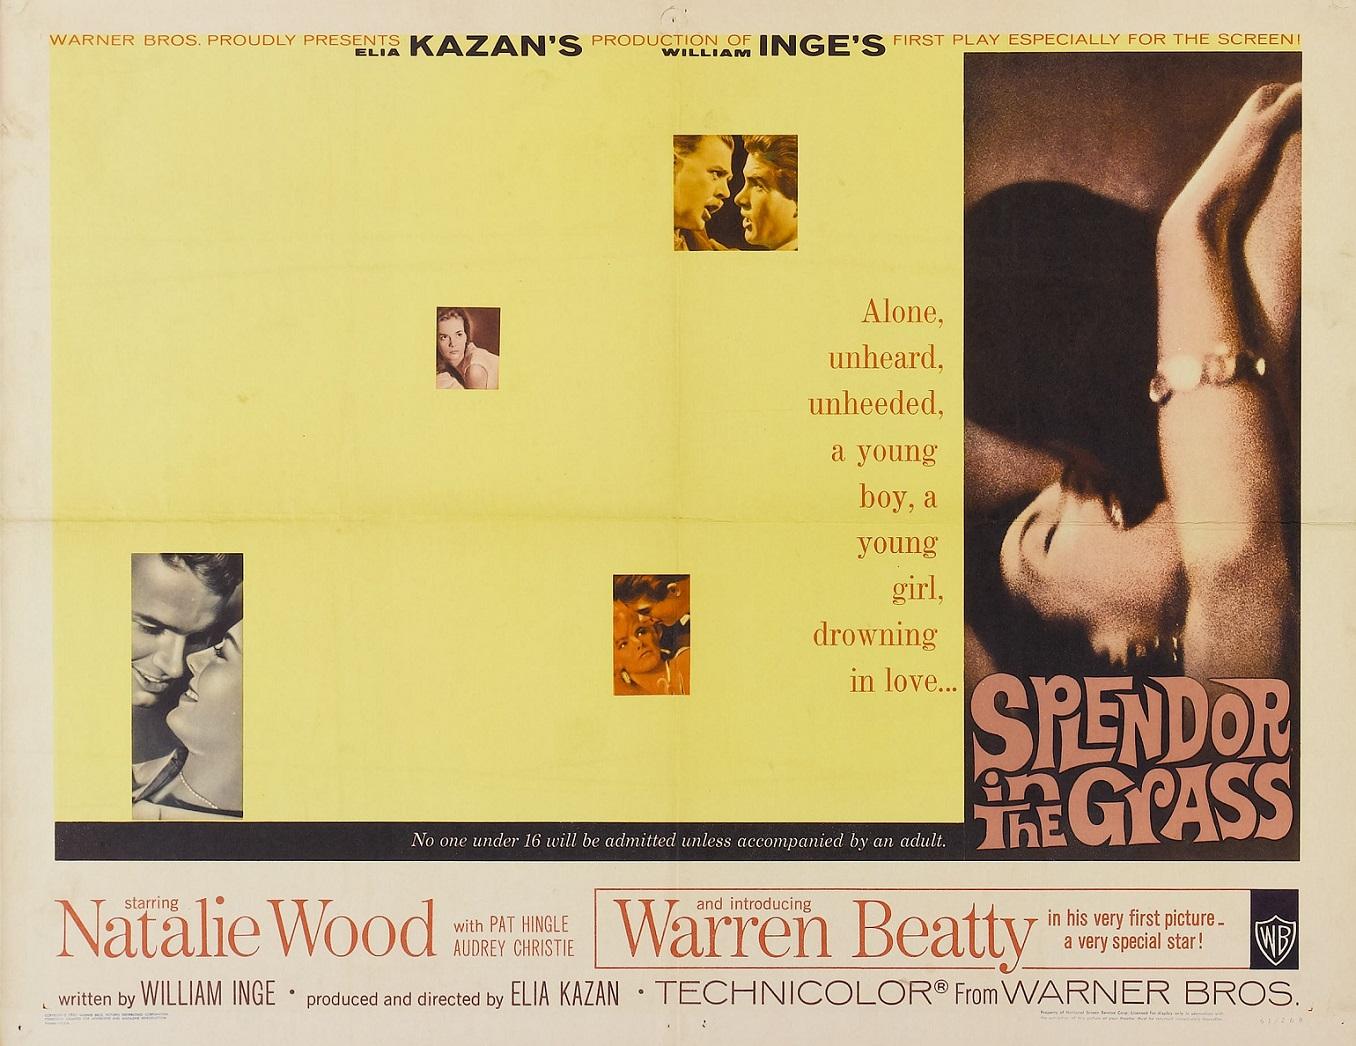 SPLENDOR IN THE GRASS (1961) WEB SITE